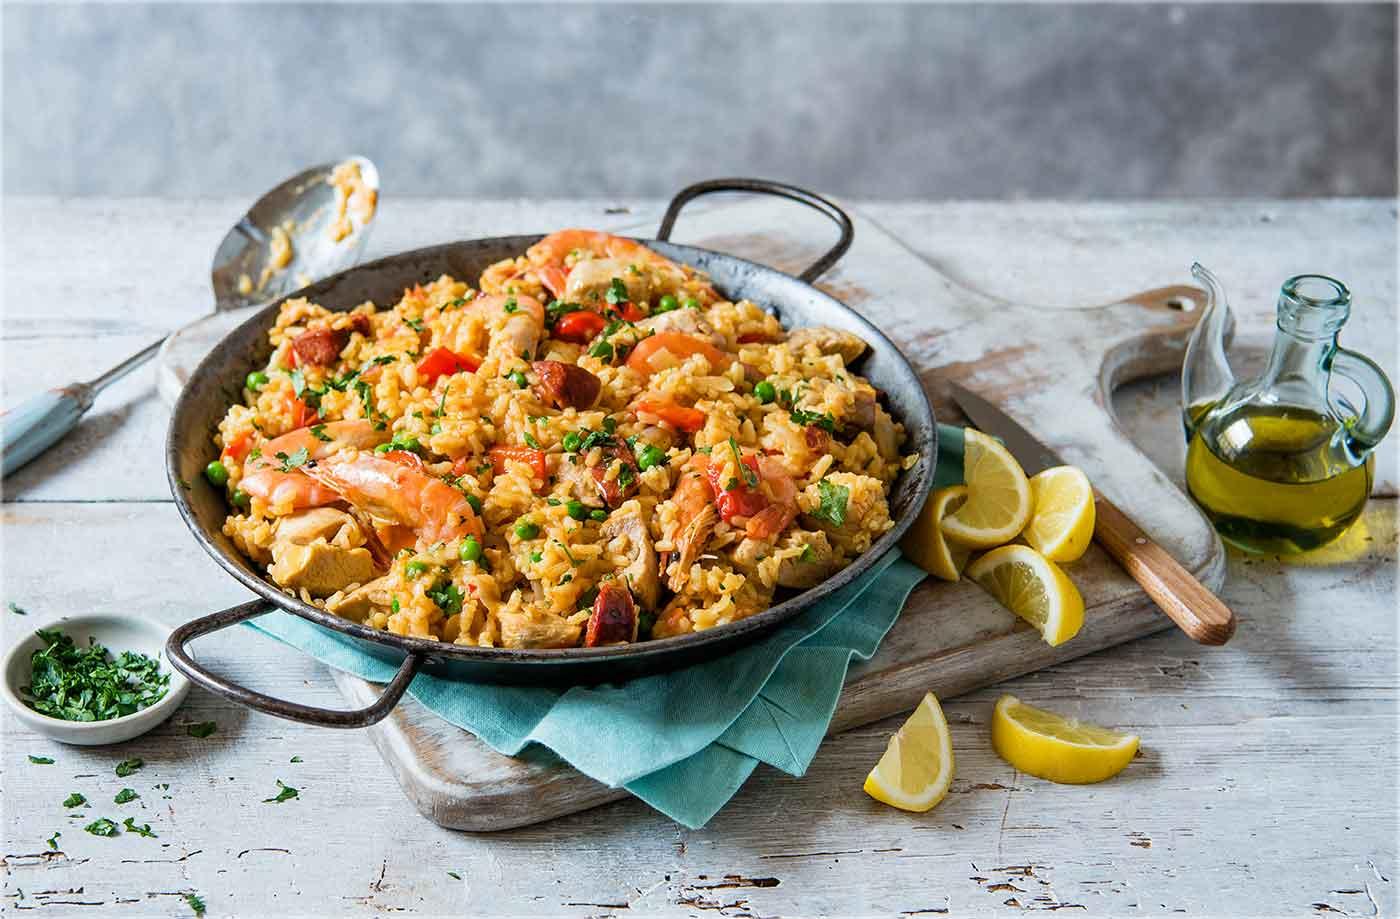 gastronoma-espaola-paellajpg